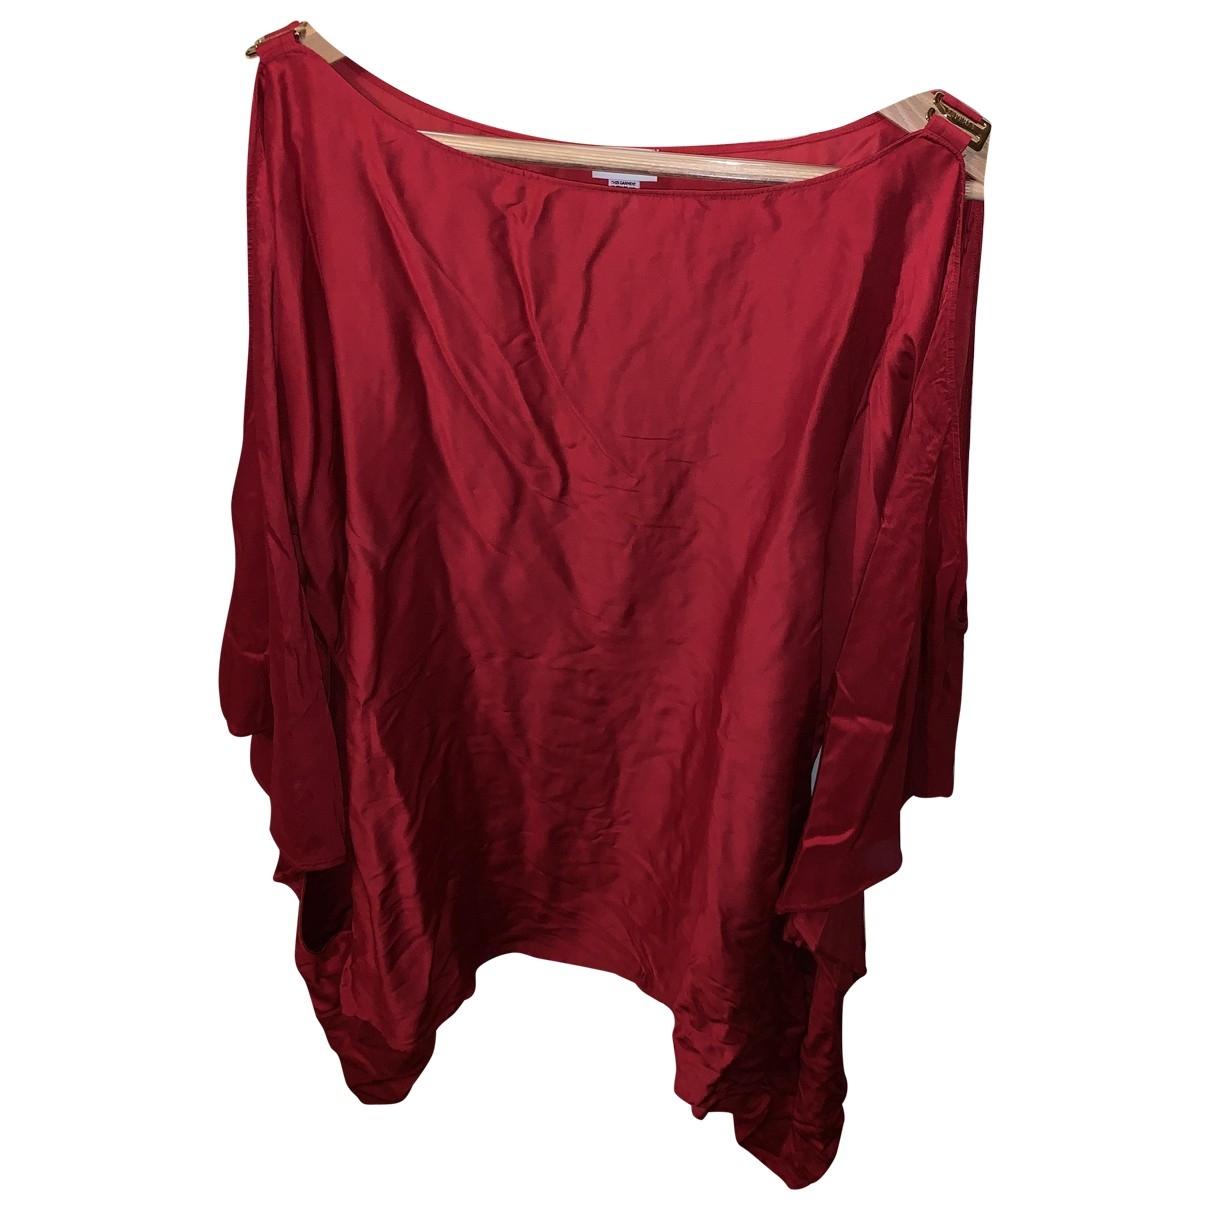 La Perla \N Badeanzug in  Rot Synthetik